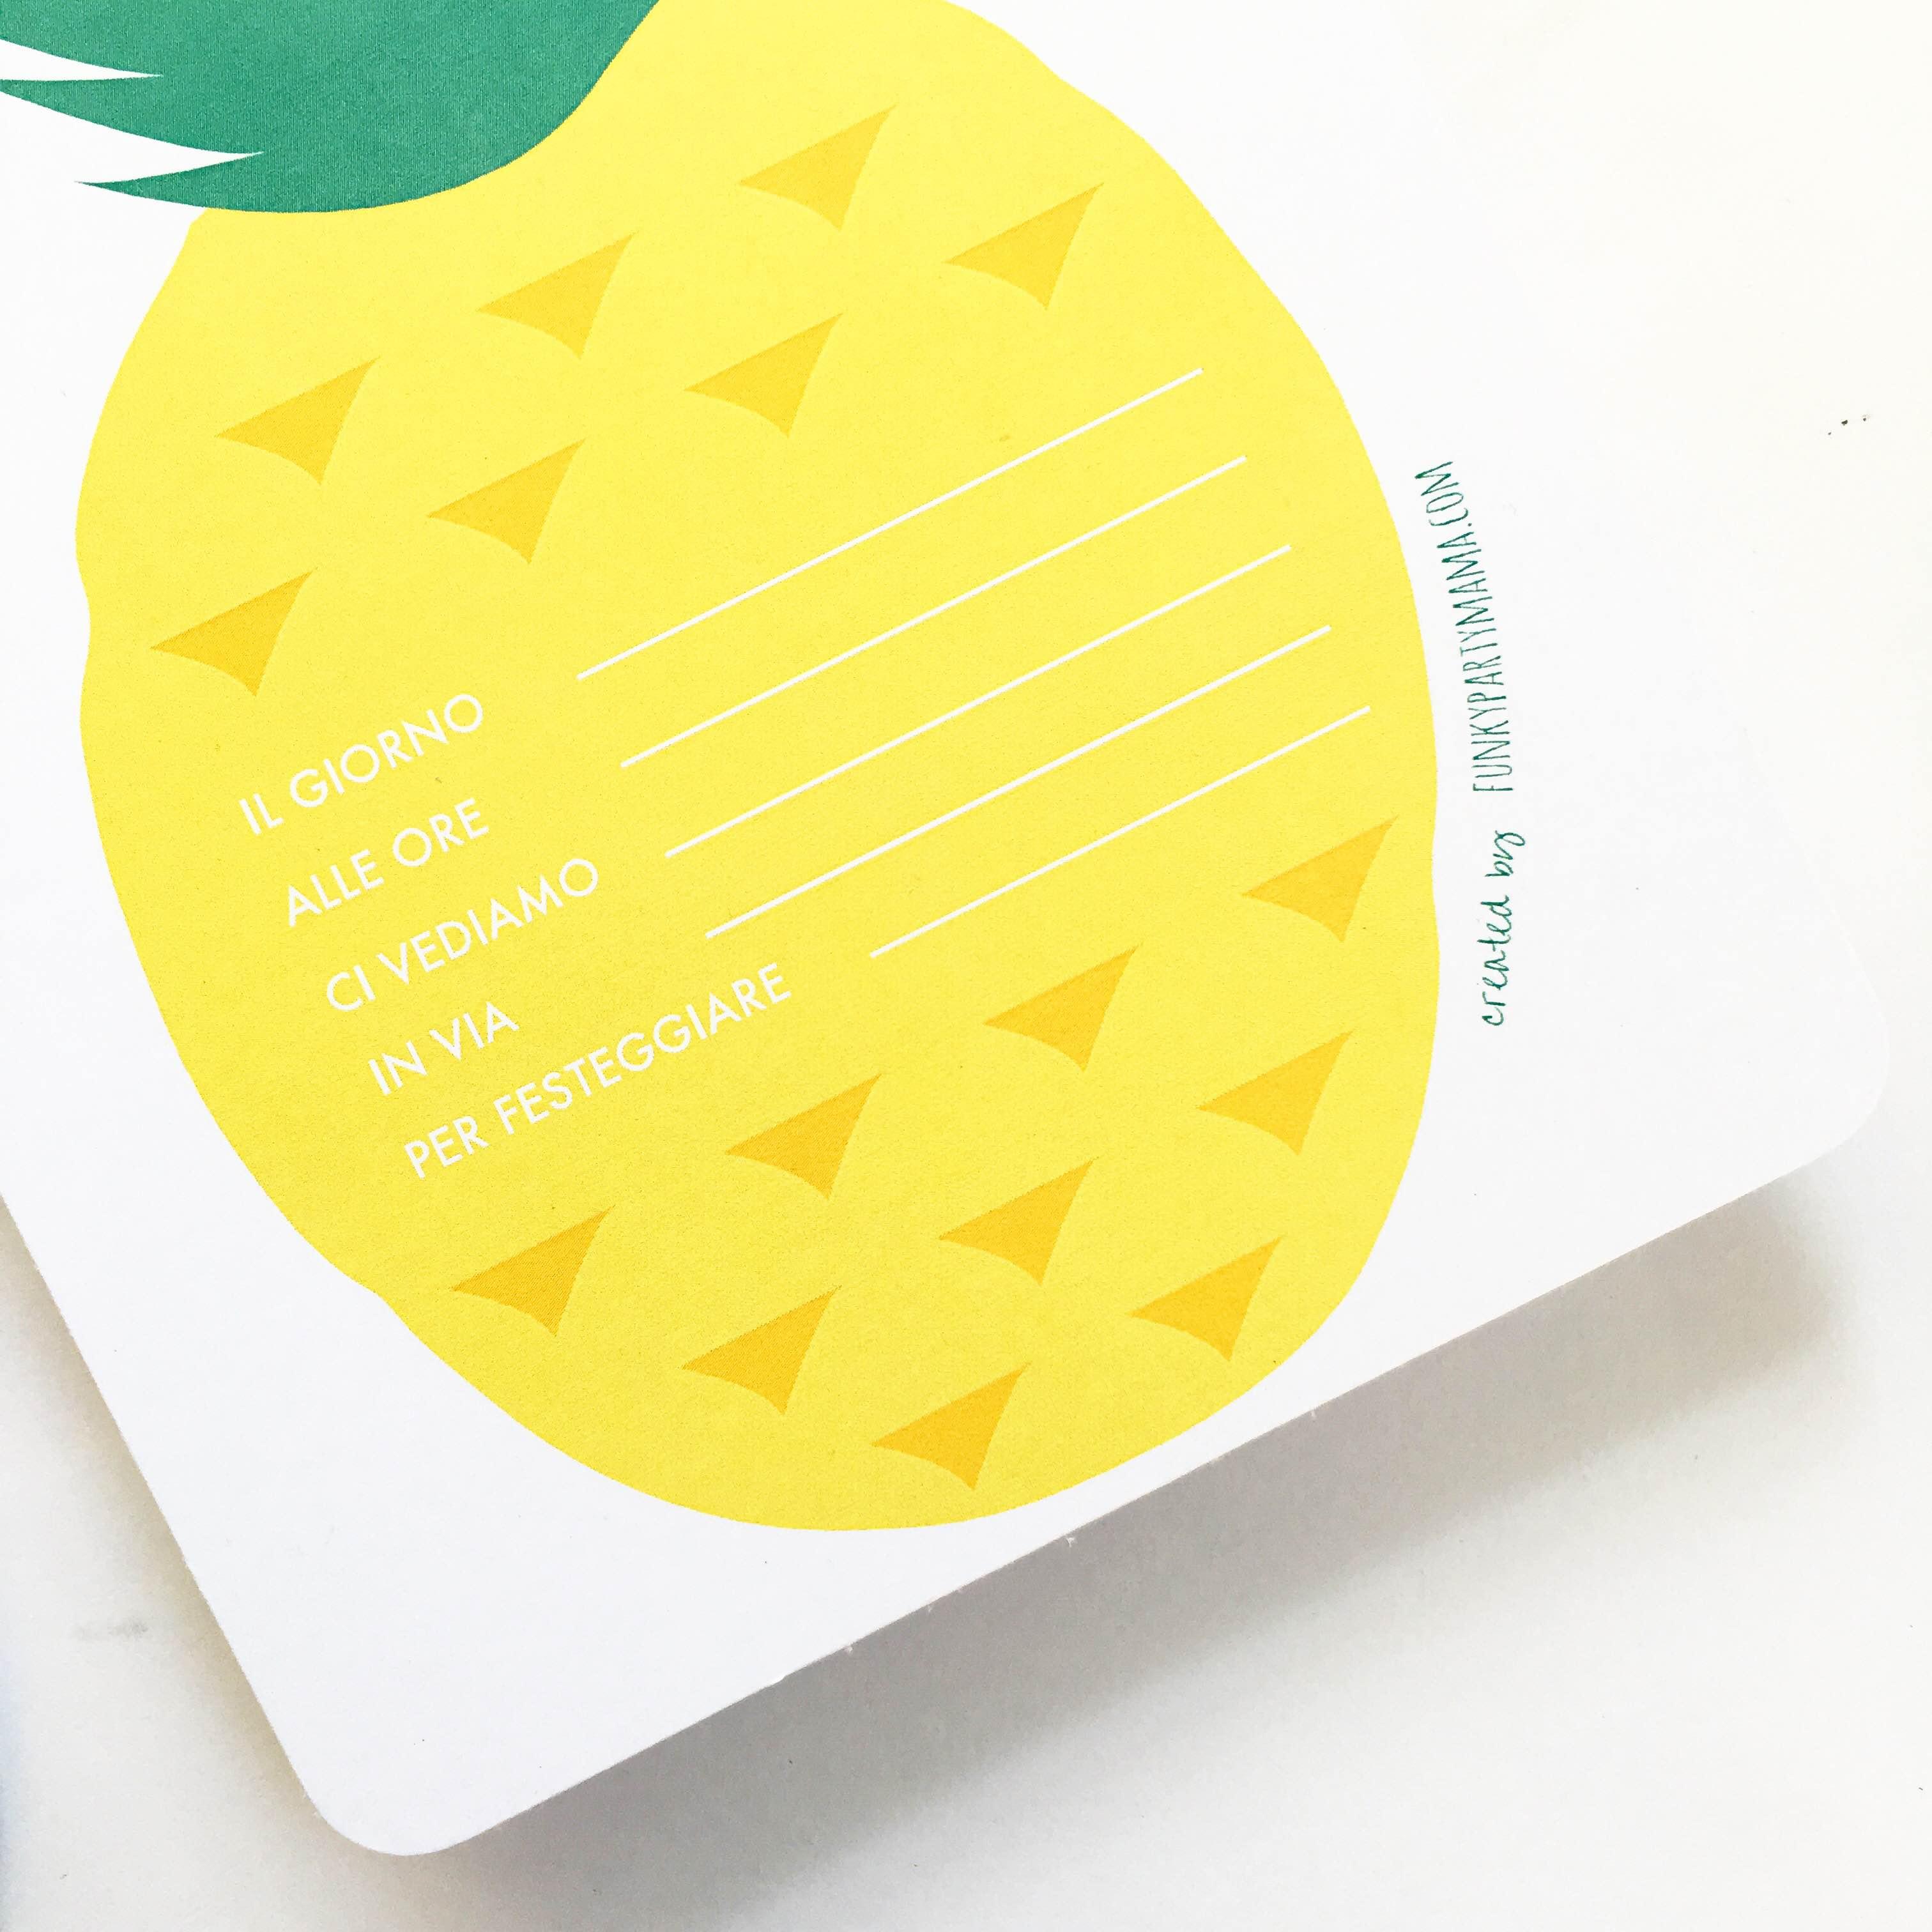 Pineapple Party - Kit Stampabile *free* - Le Civette Sul Comò - Free Printable Pineapple Invitations